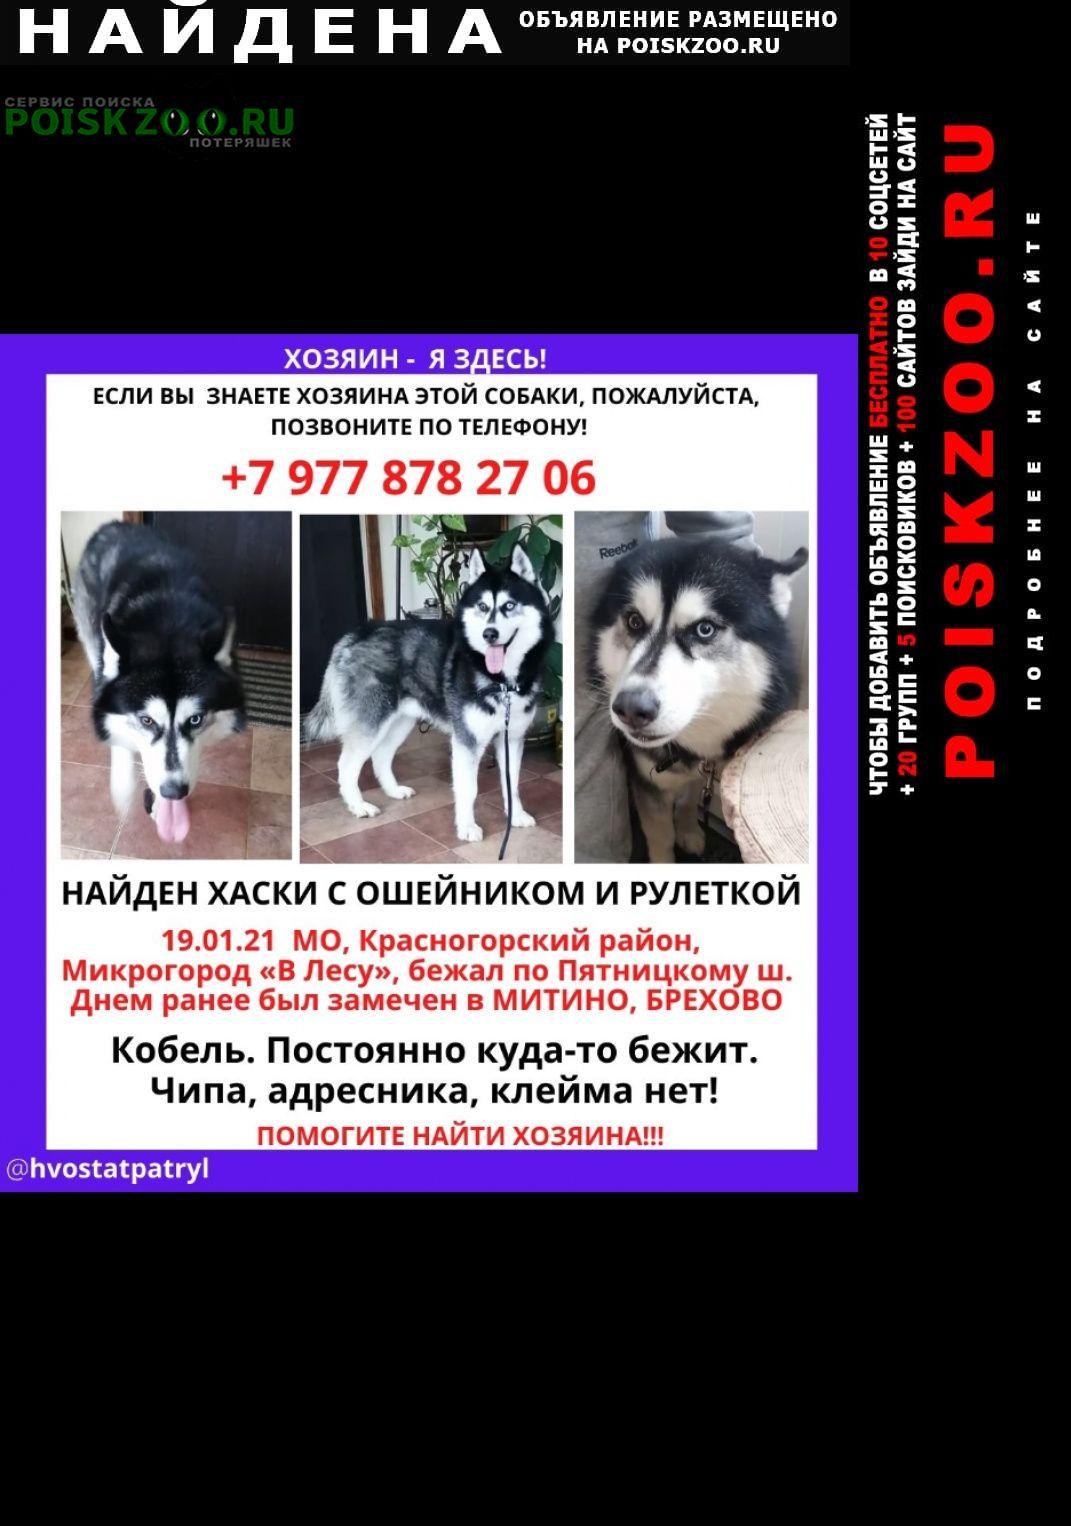 Найдена собака породы хаски Москва